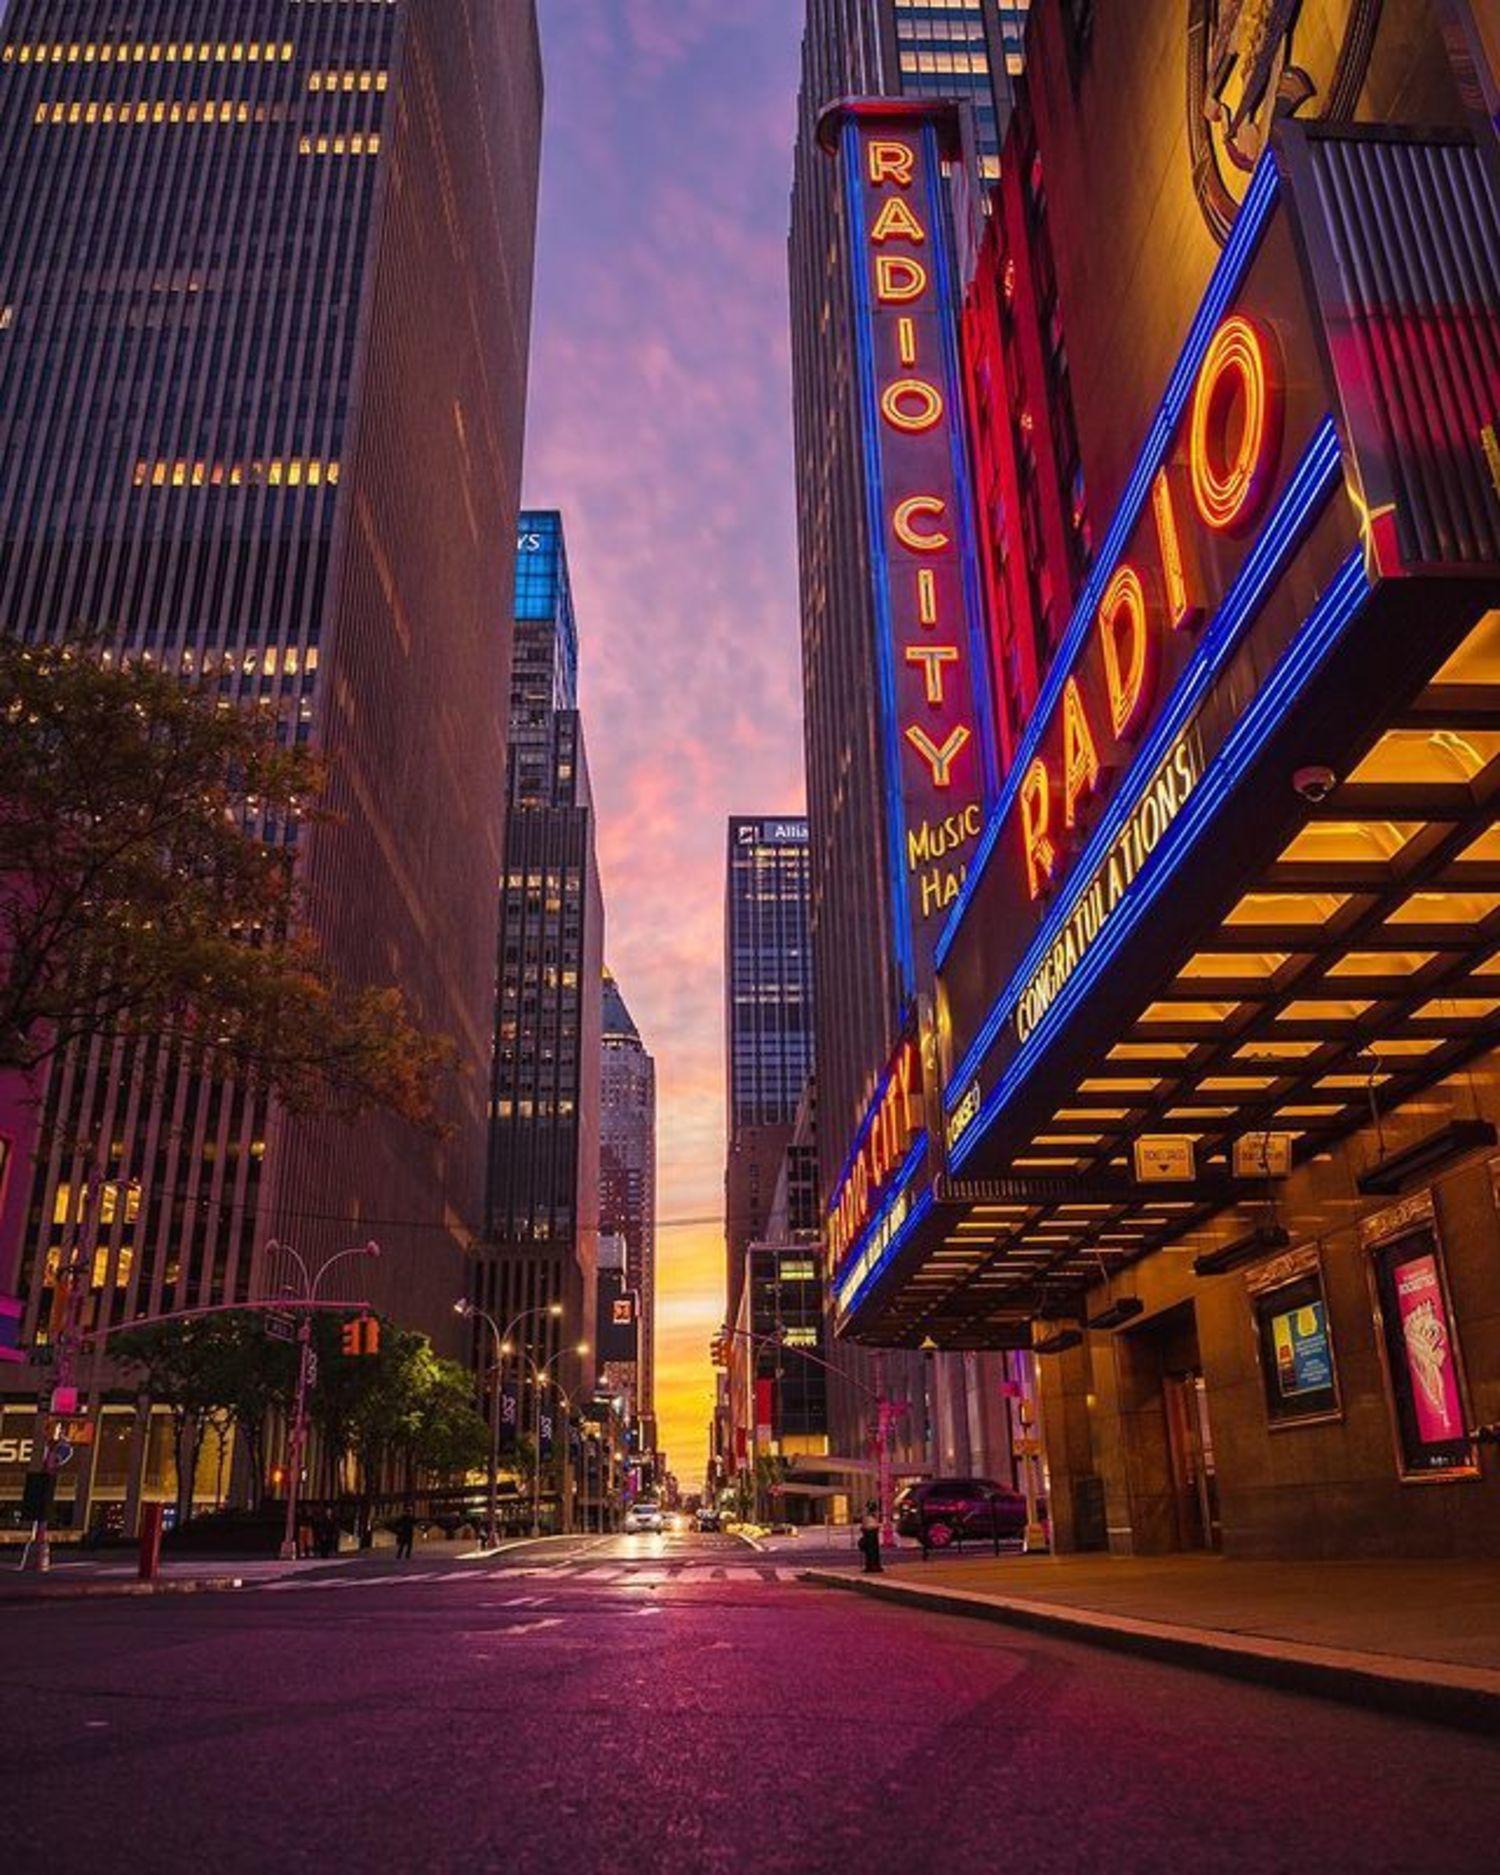 Radio City Music Hall, 6th Avenue, Midtown, Manhattan